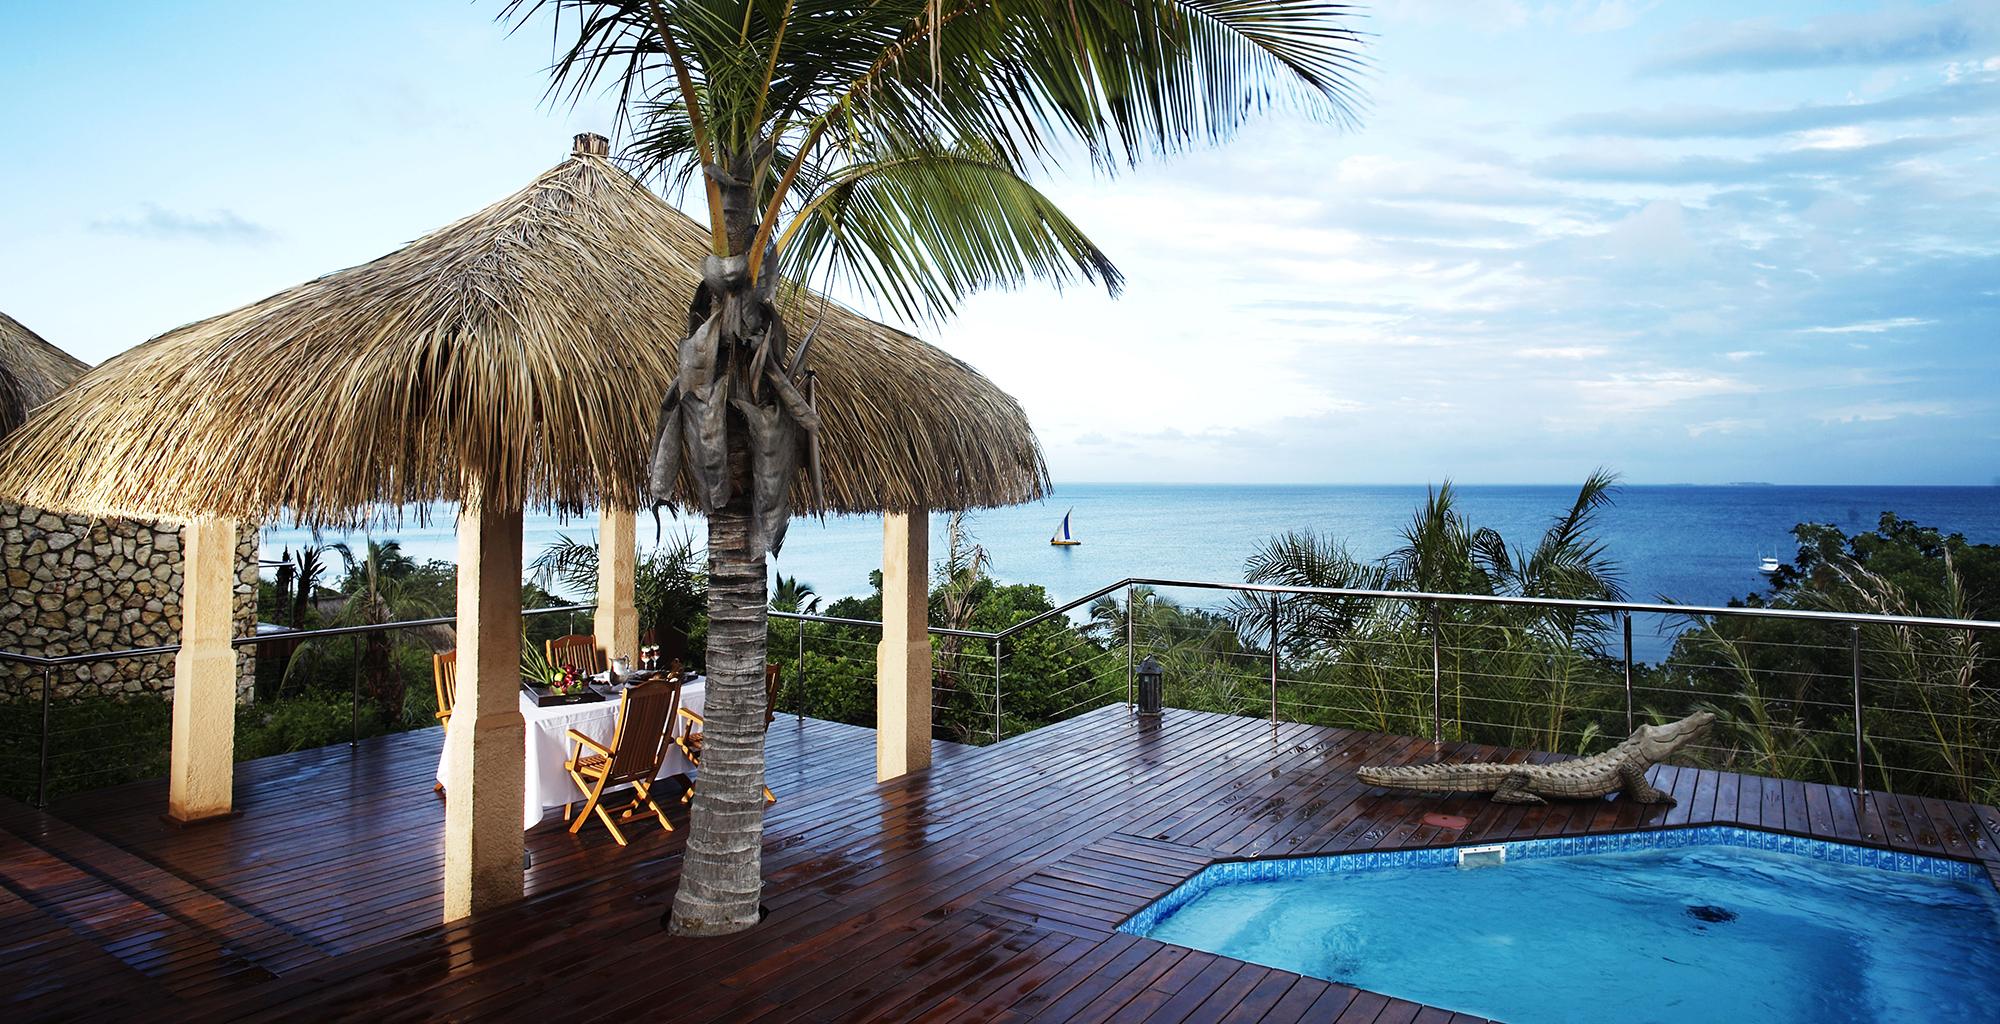 Mozambique-Bazaruto-Archipelago-Anantara-Swimming-Pool